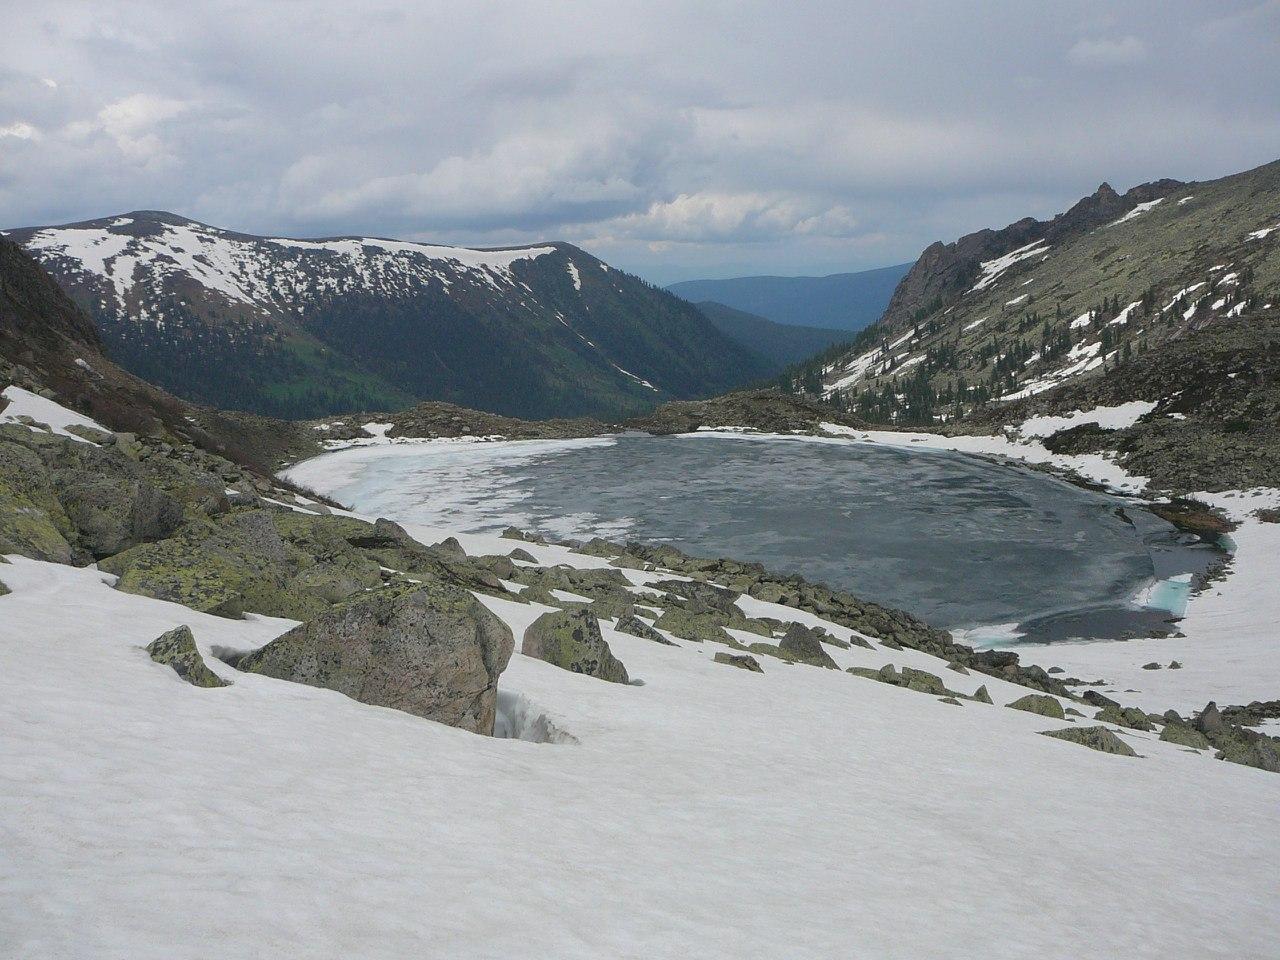 Озеро Северное. Фото: Константин Бураков